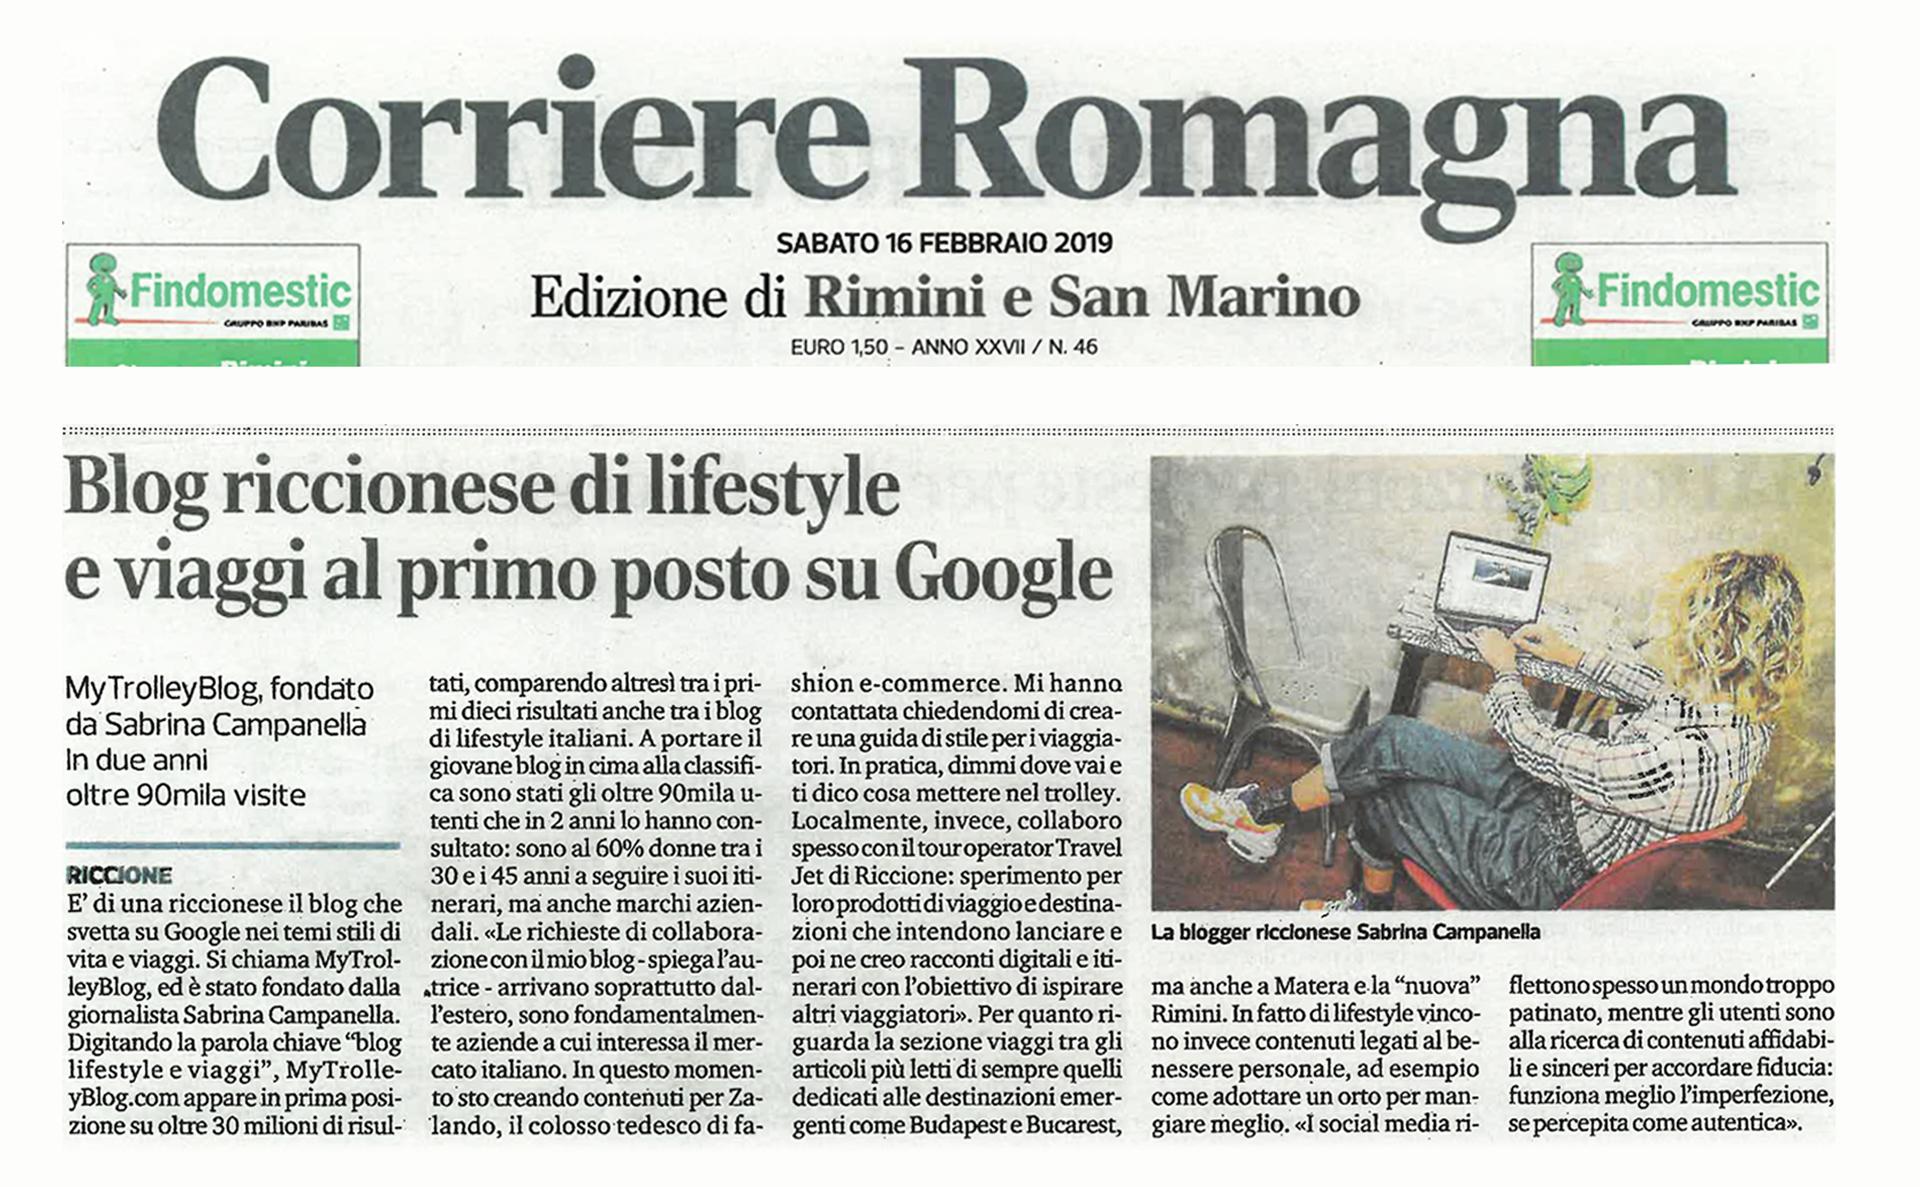 Corriere Romagna - Sab, mytrolleyblog